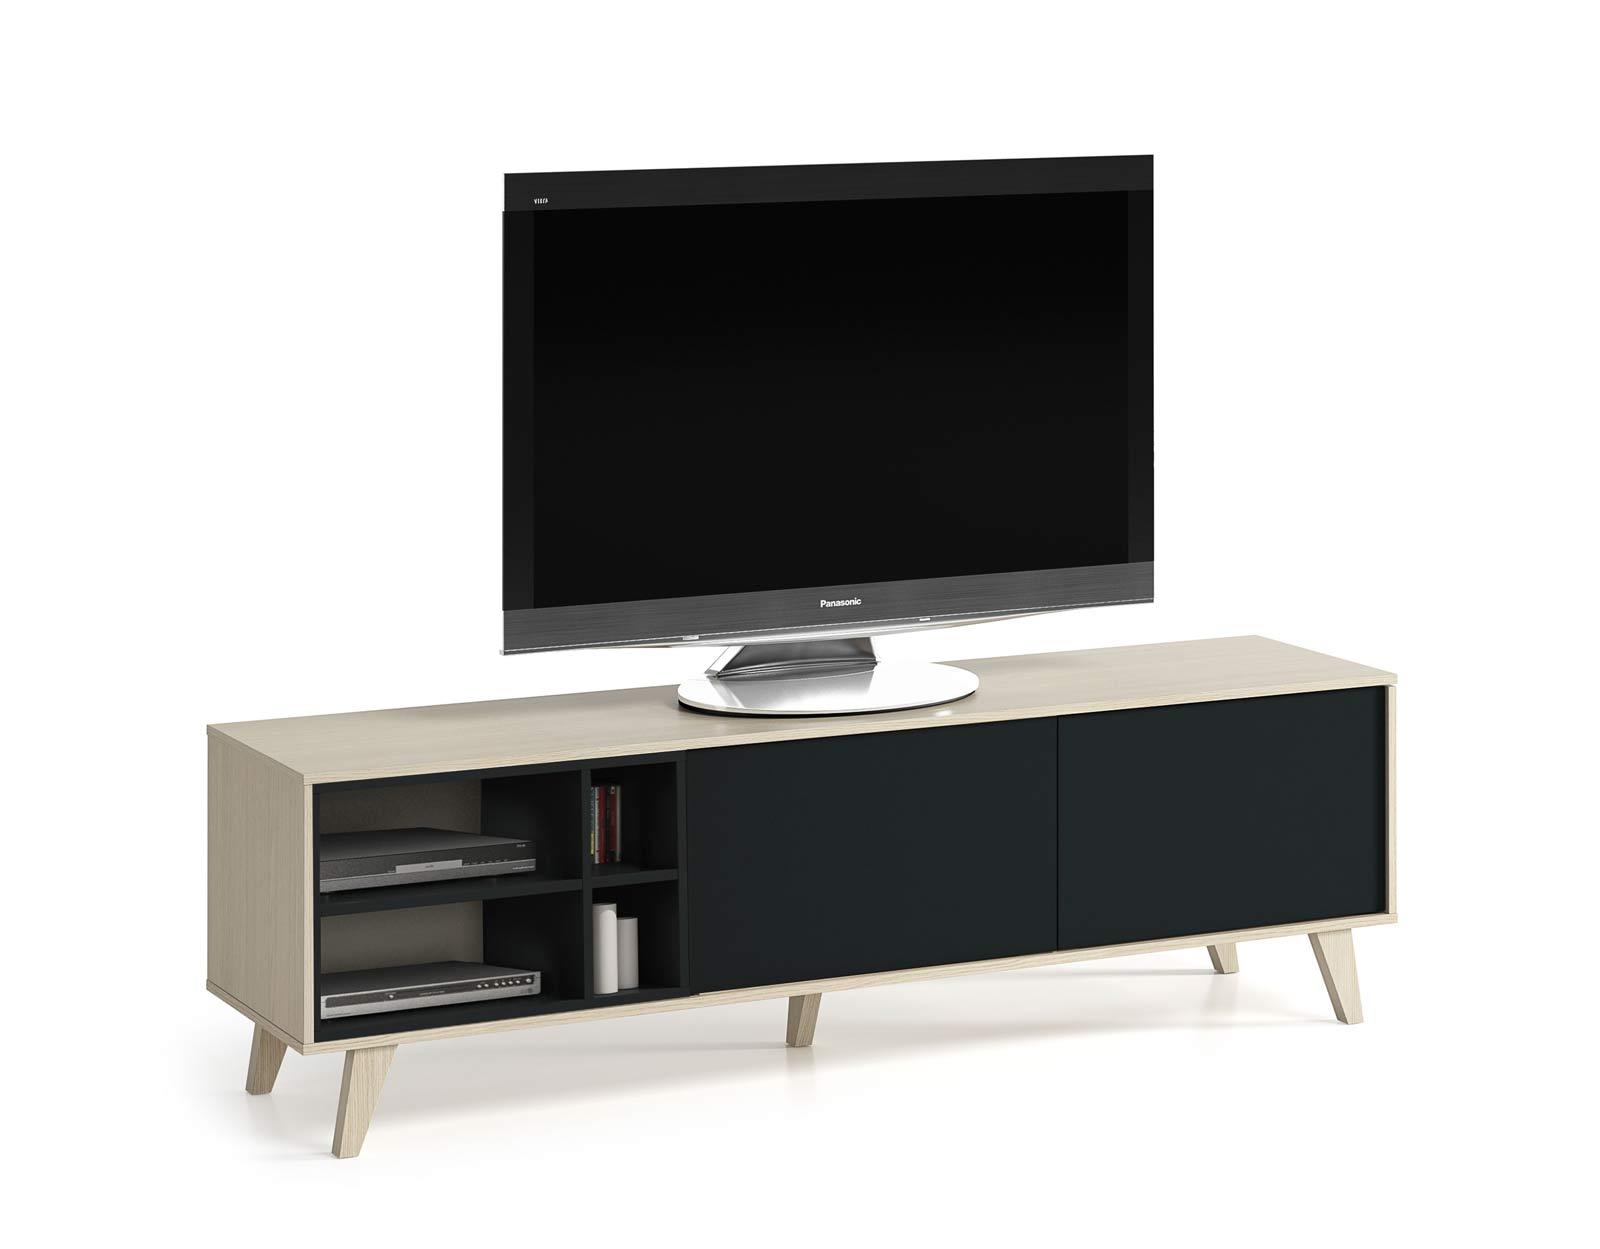 mueble tv econ mico